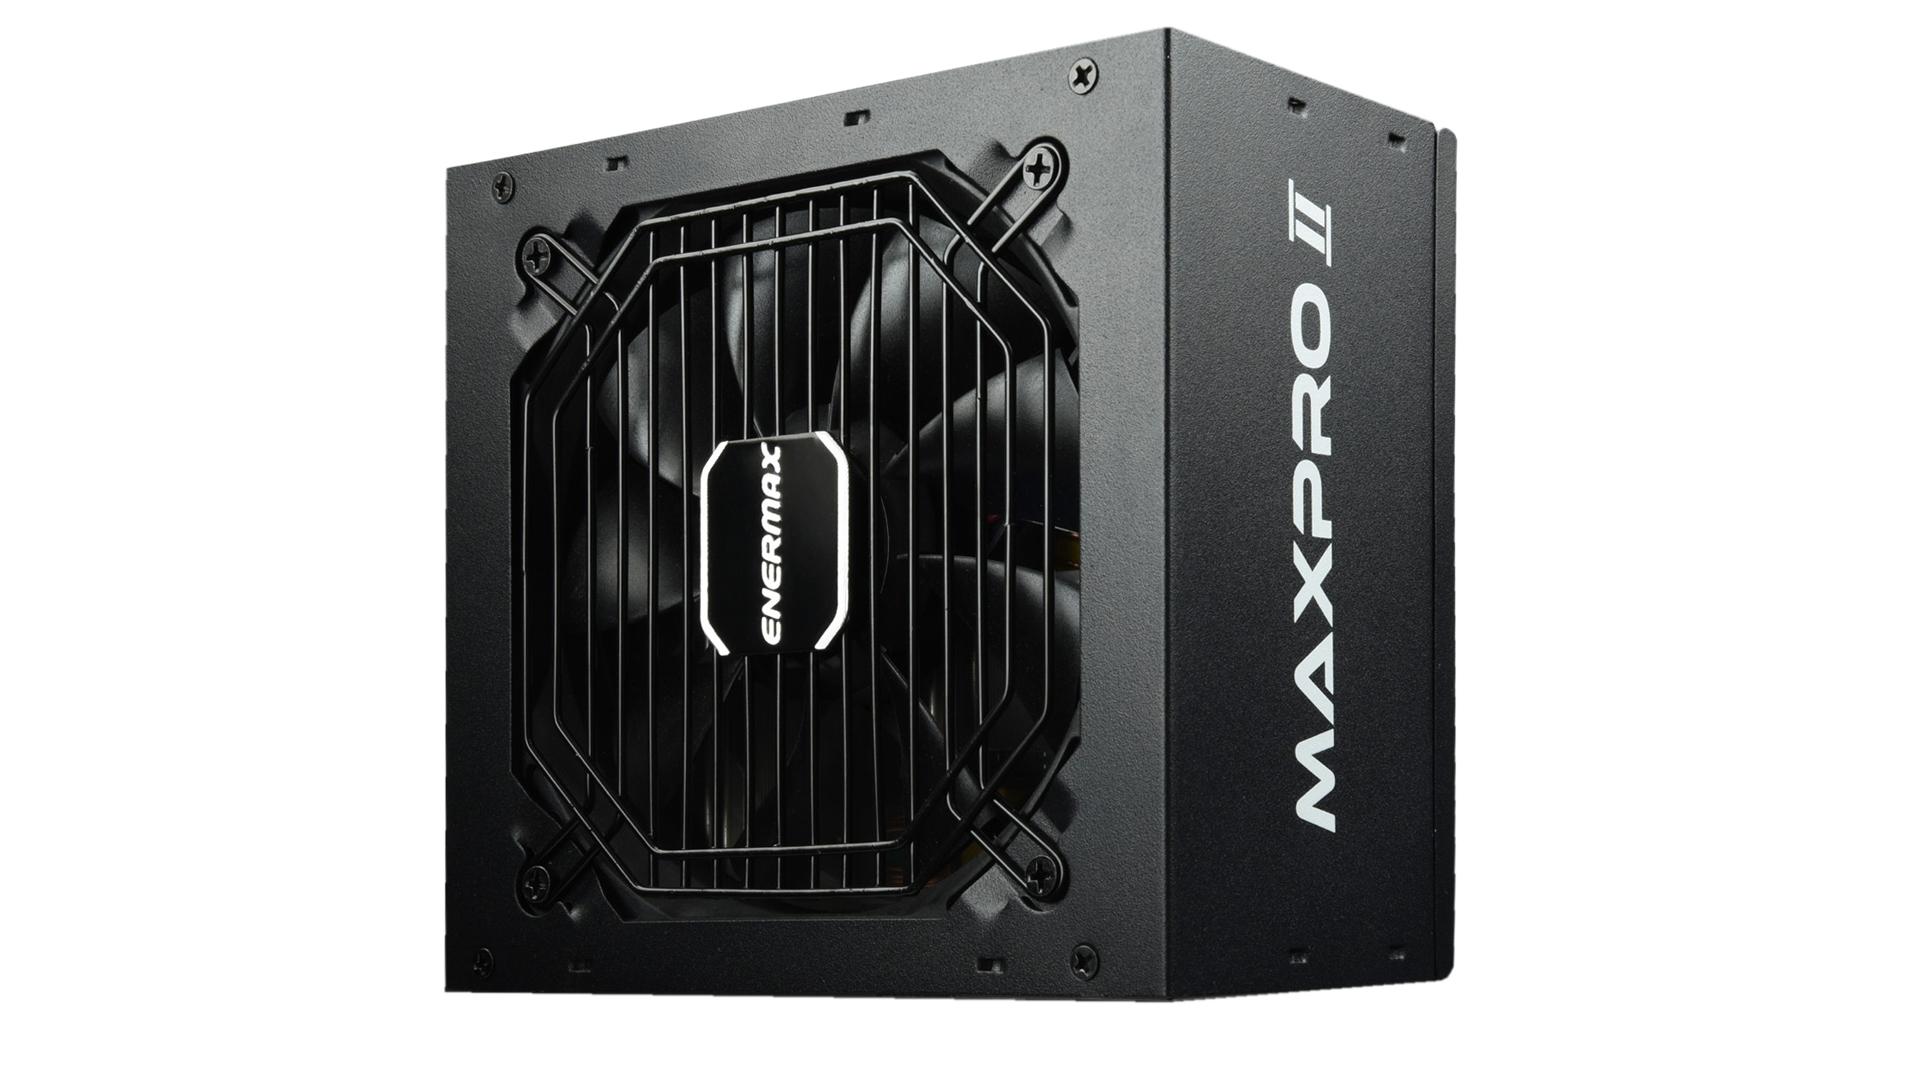 Enermax MaxPro II EMP700AGT-C 700Watt